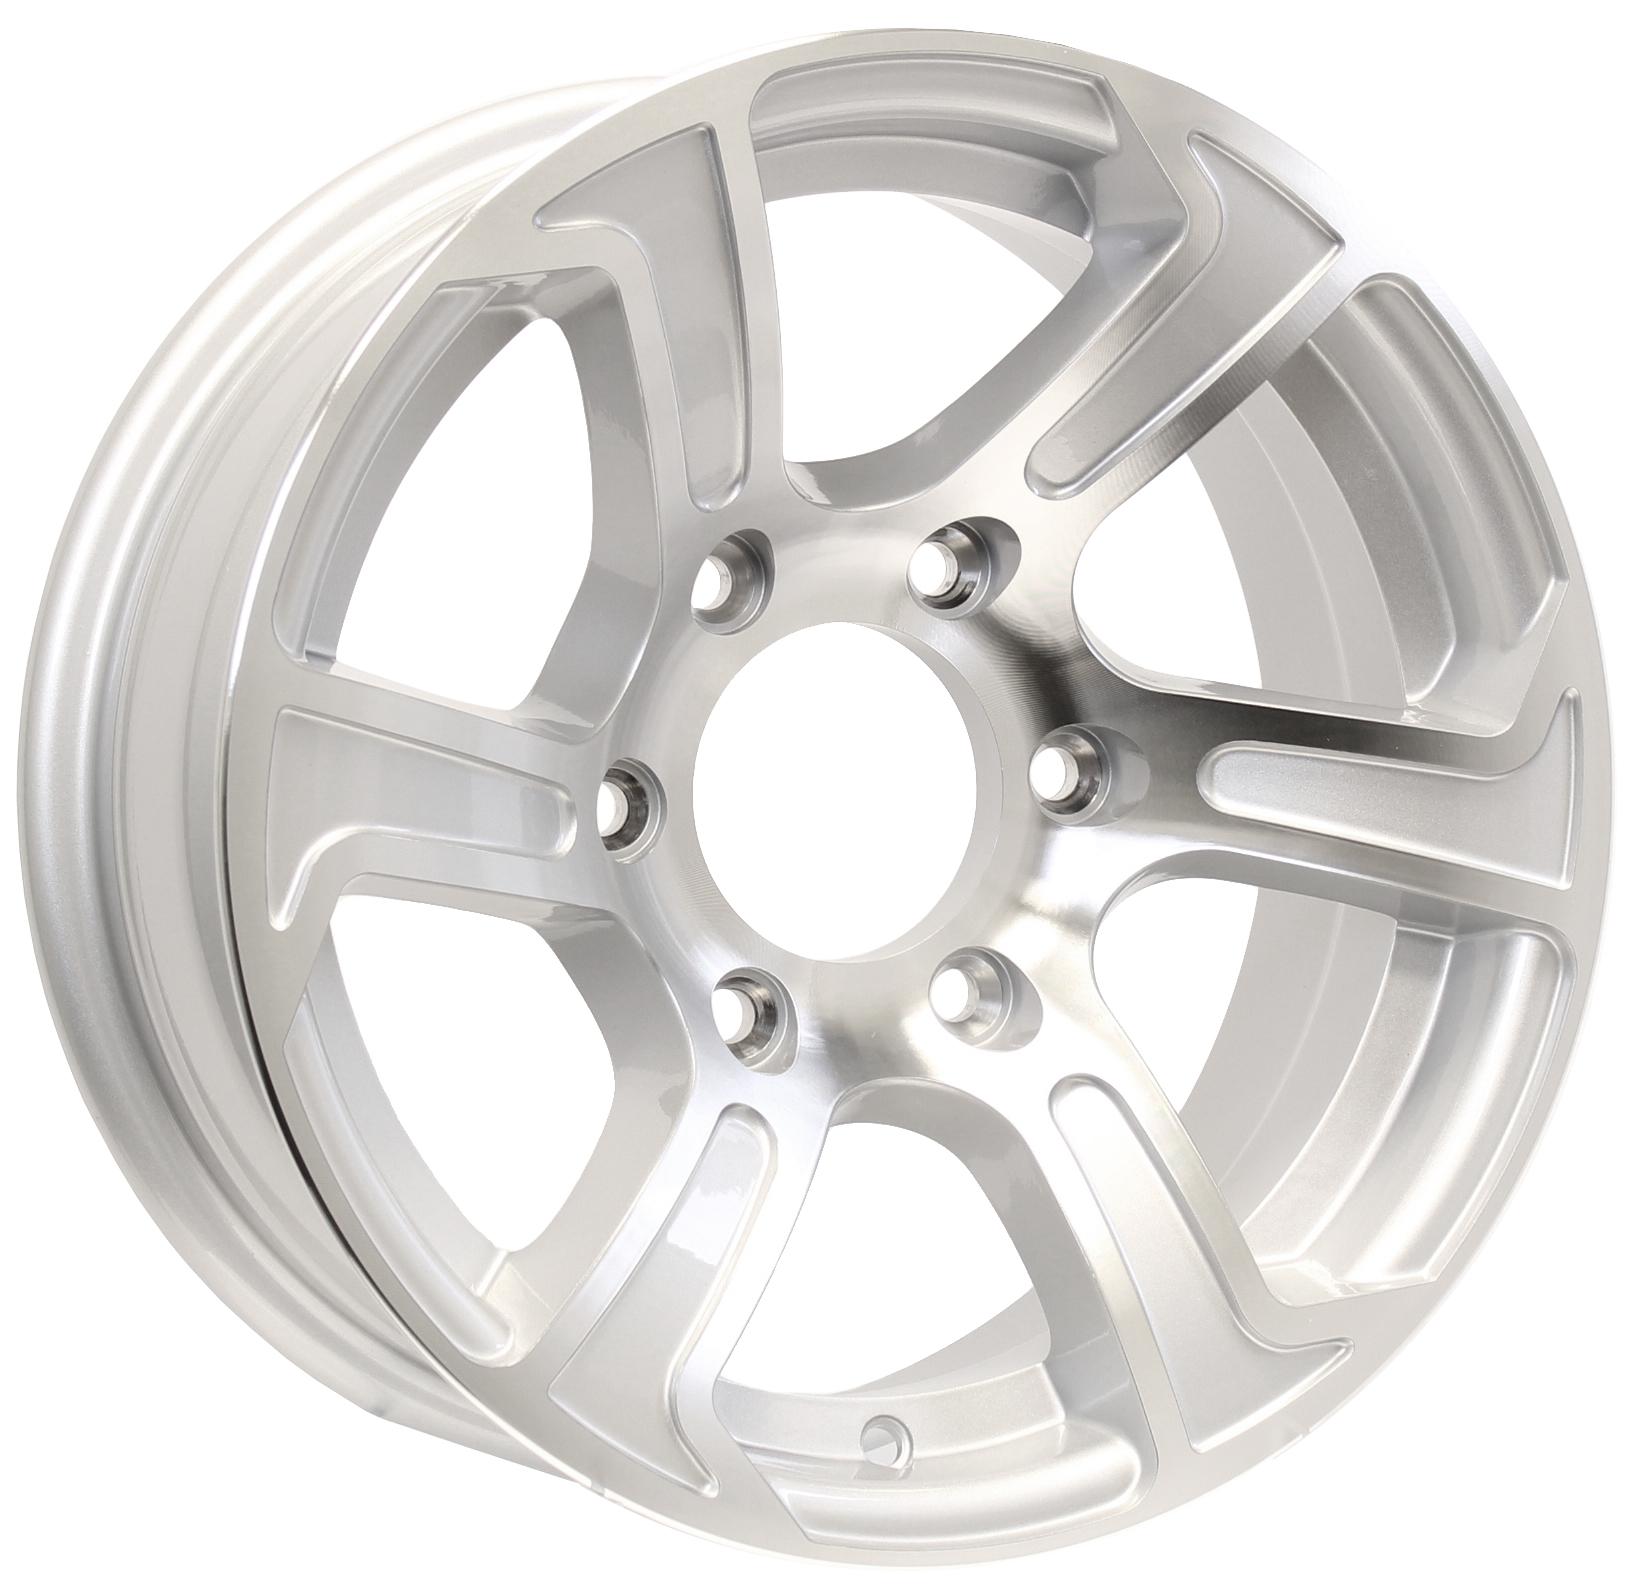 "Summit 15"" 6-Lug Silver Aluminum Trailer Wheel Image"